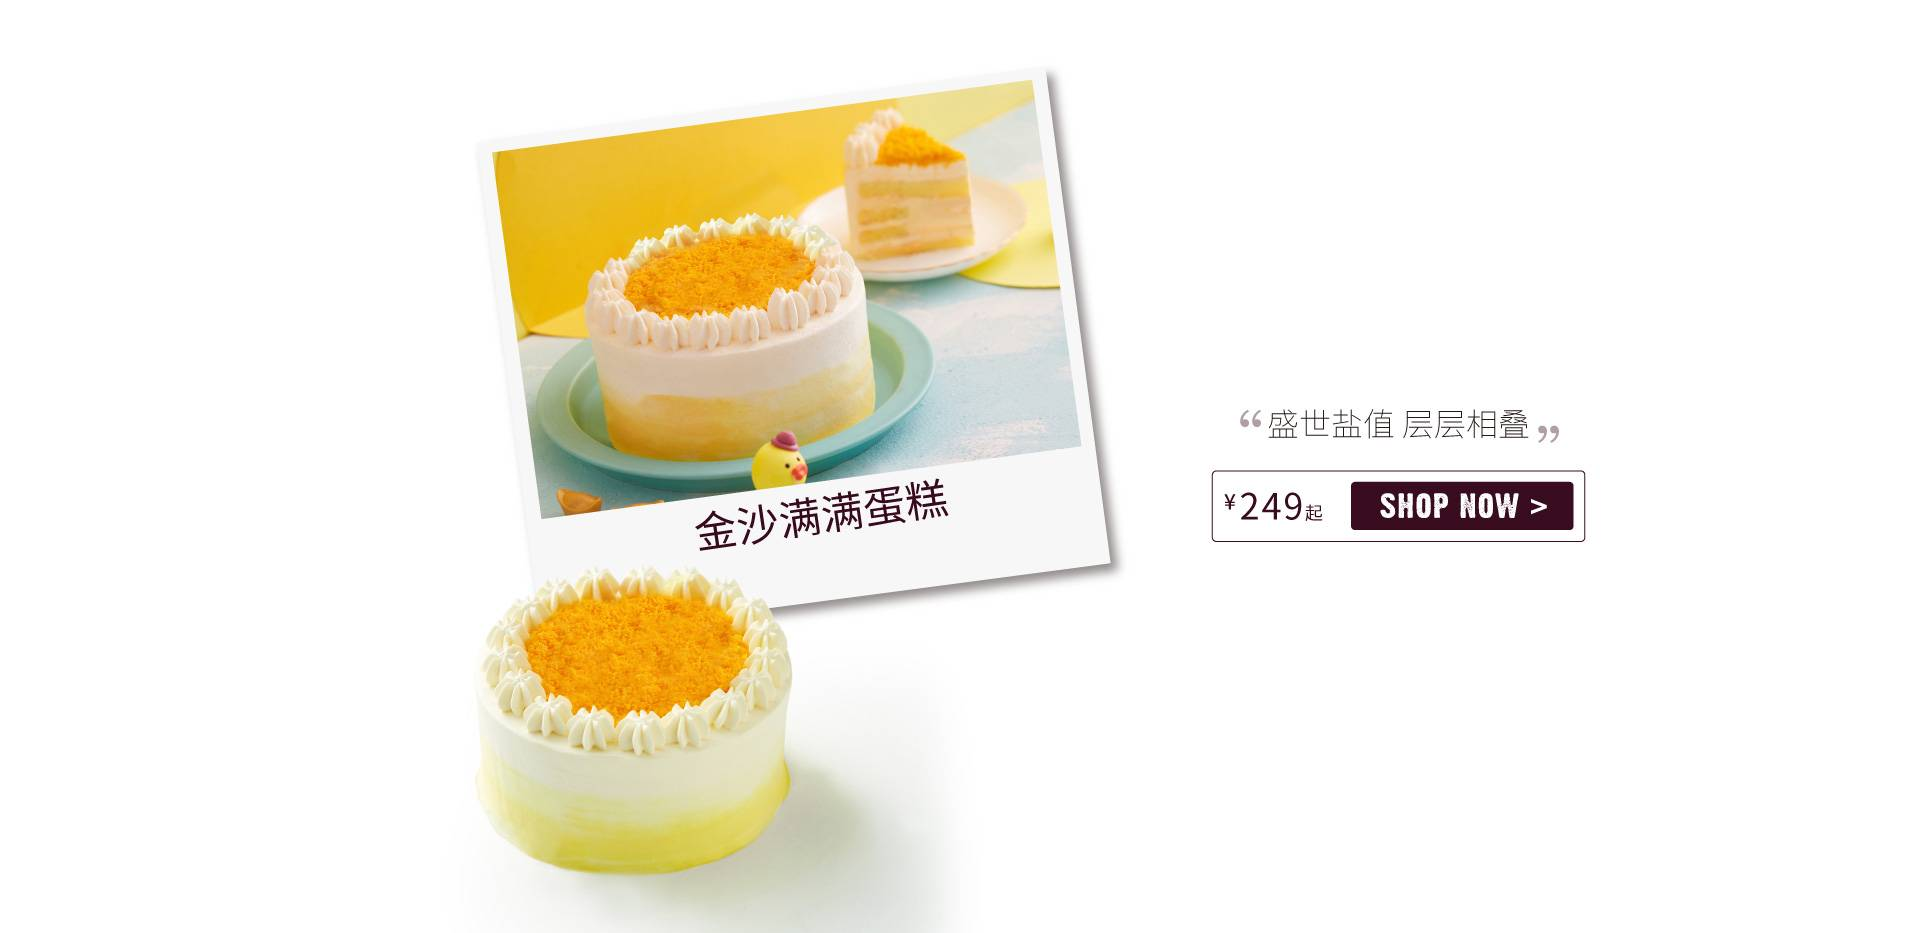 Yolk Sponge Cake